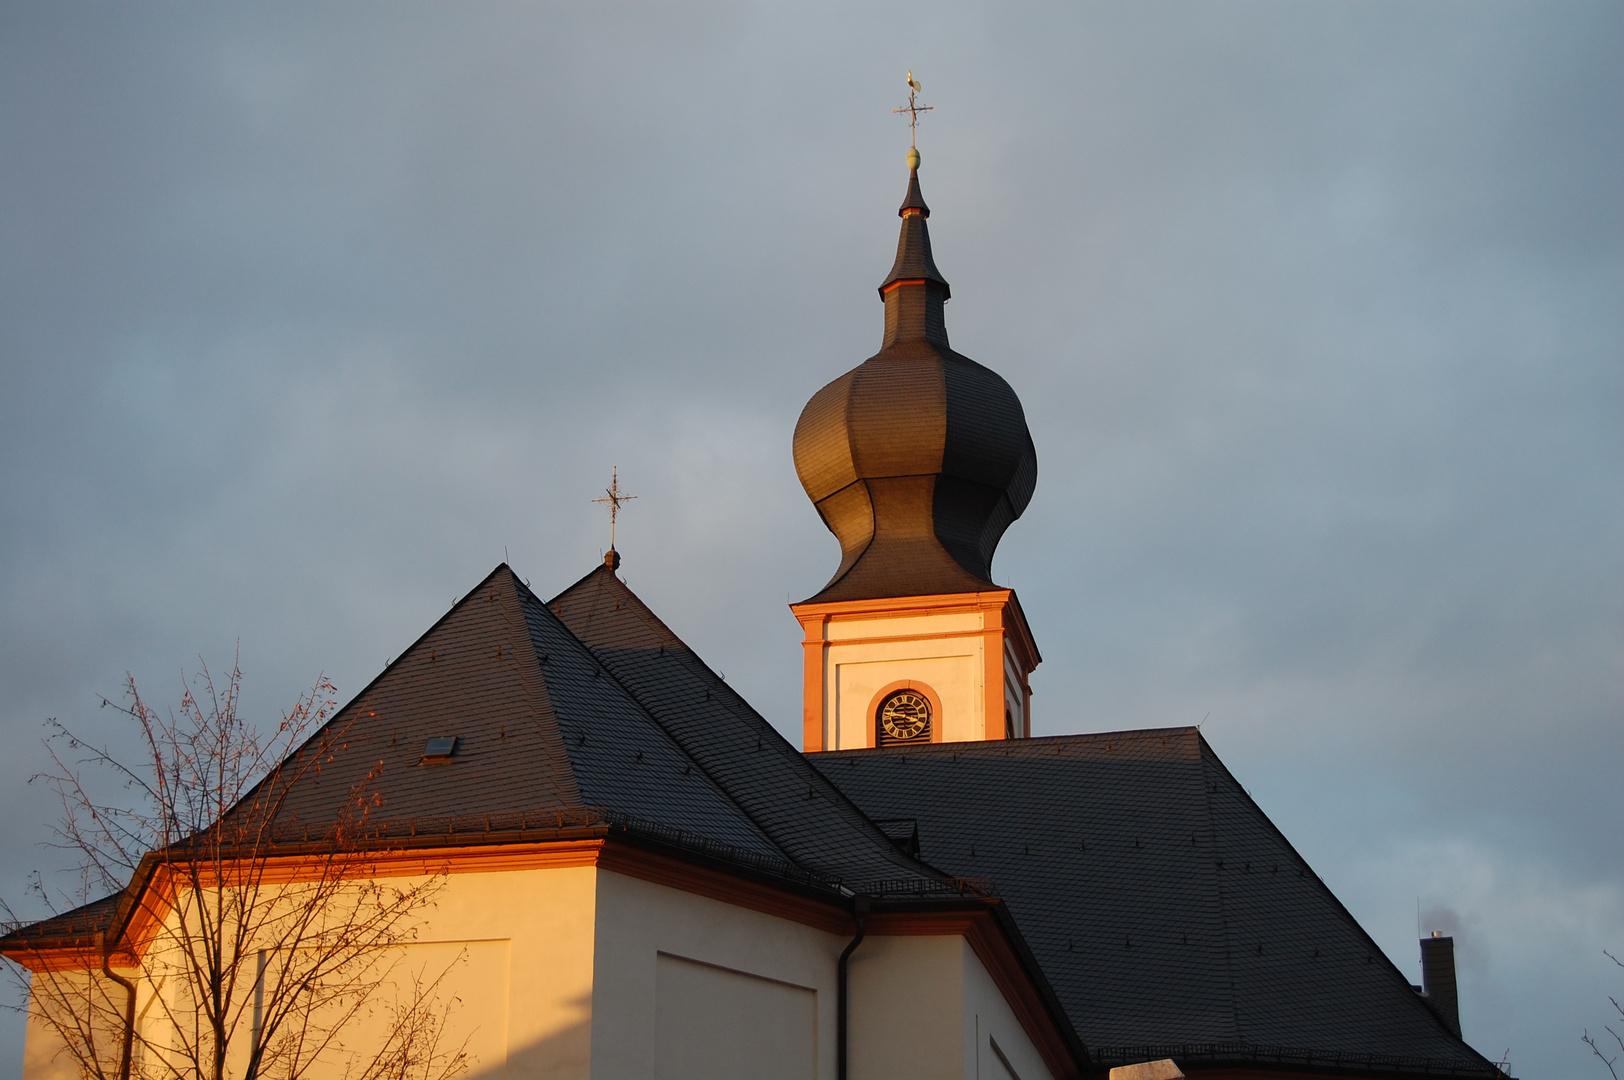 Pfarrkirche St. Maria Magdalena Gernsheim